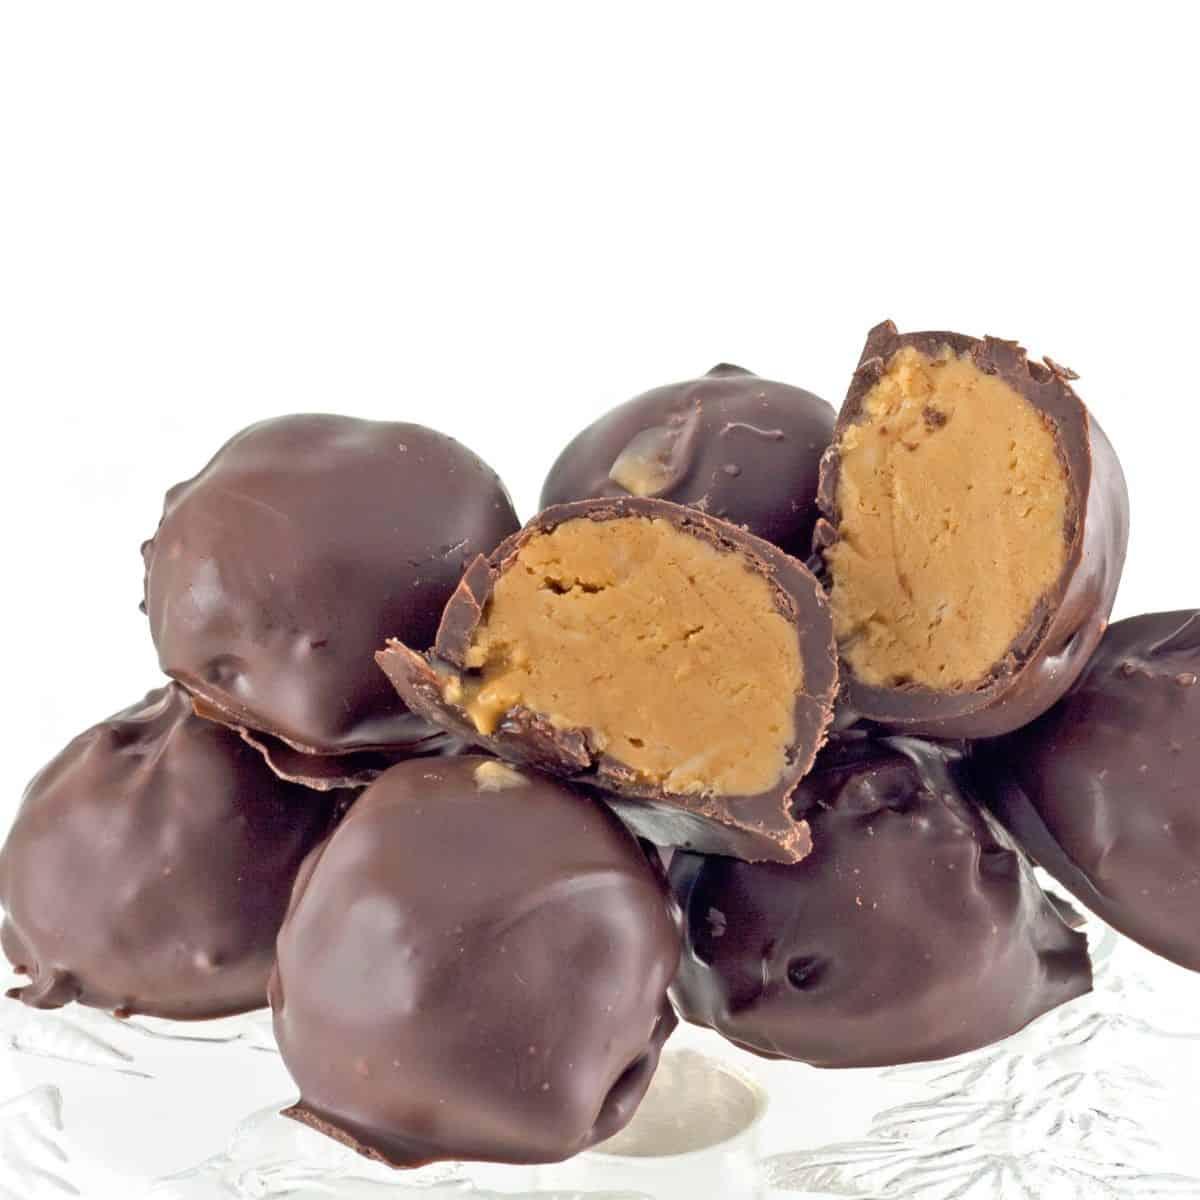 Keto Peanut Butter Cup Truffles FI